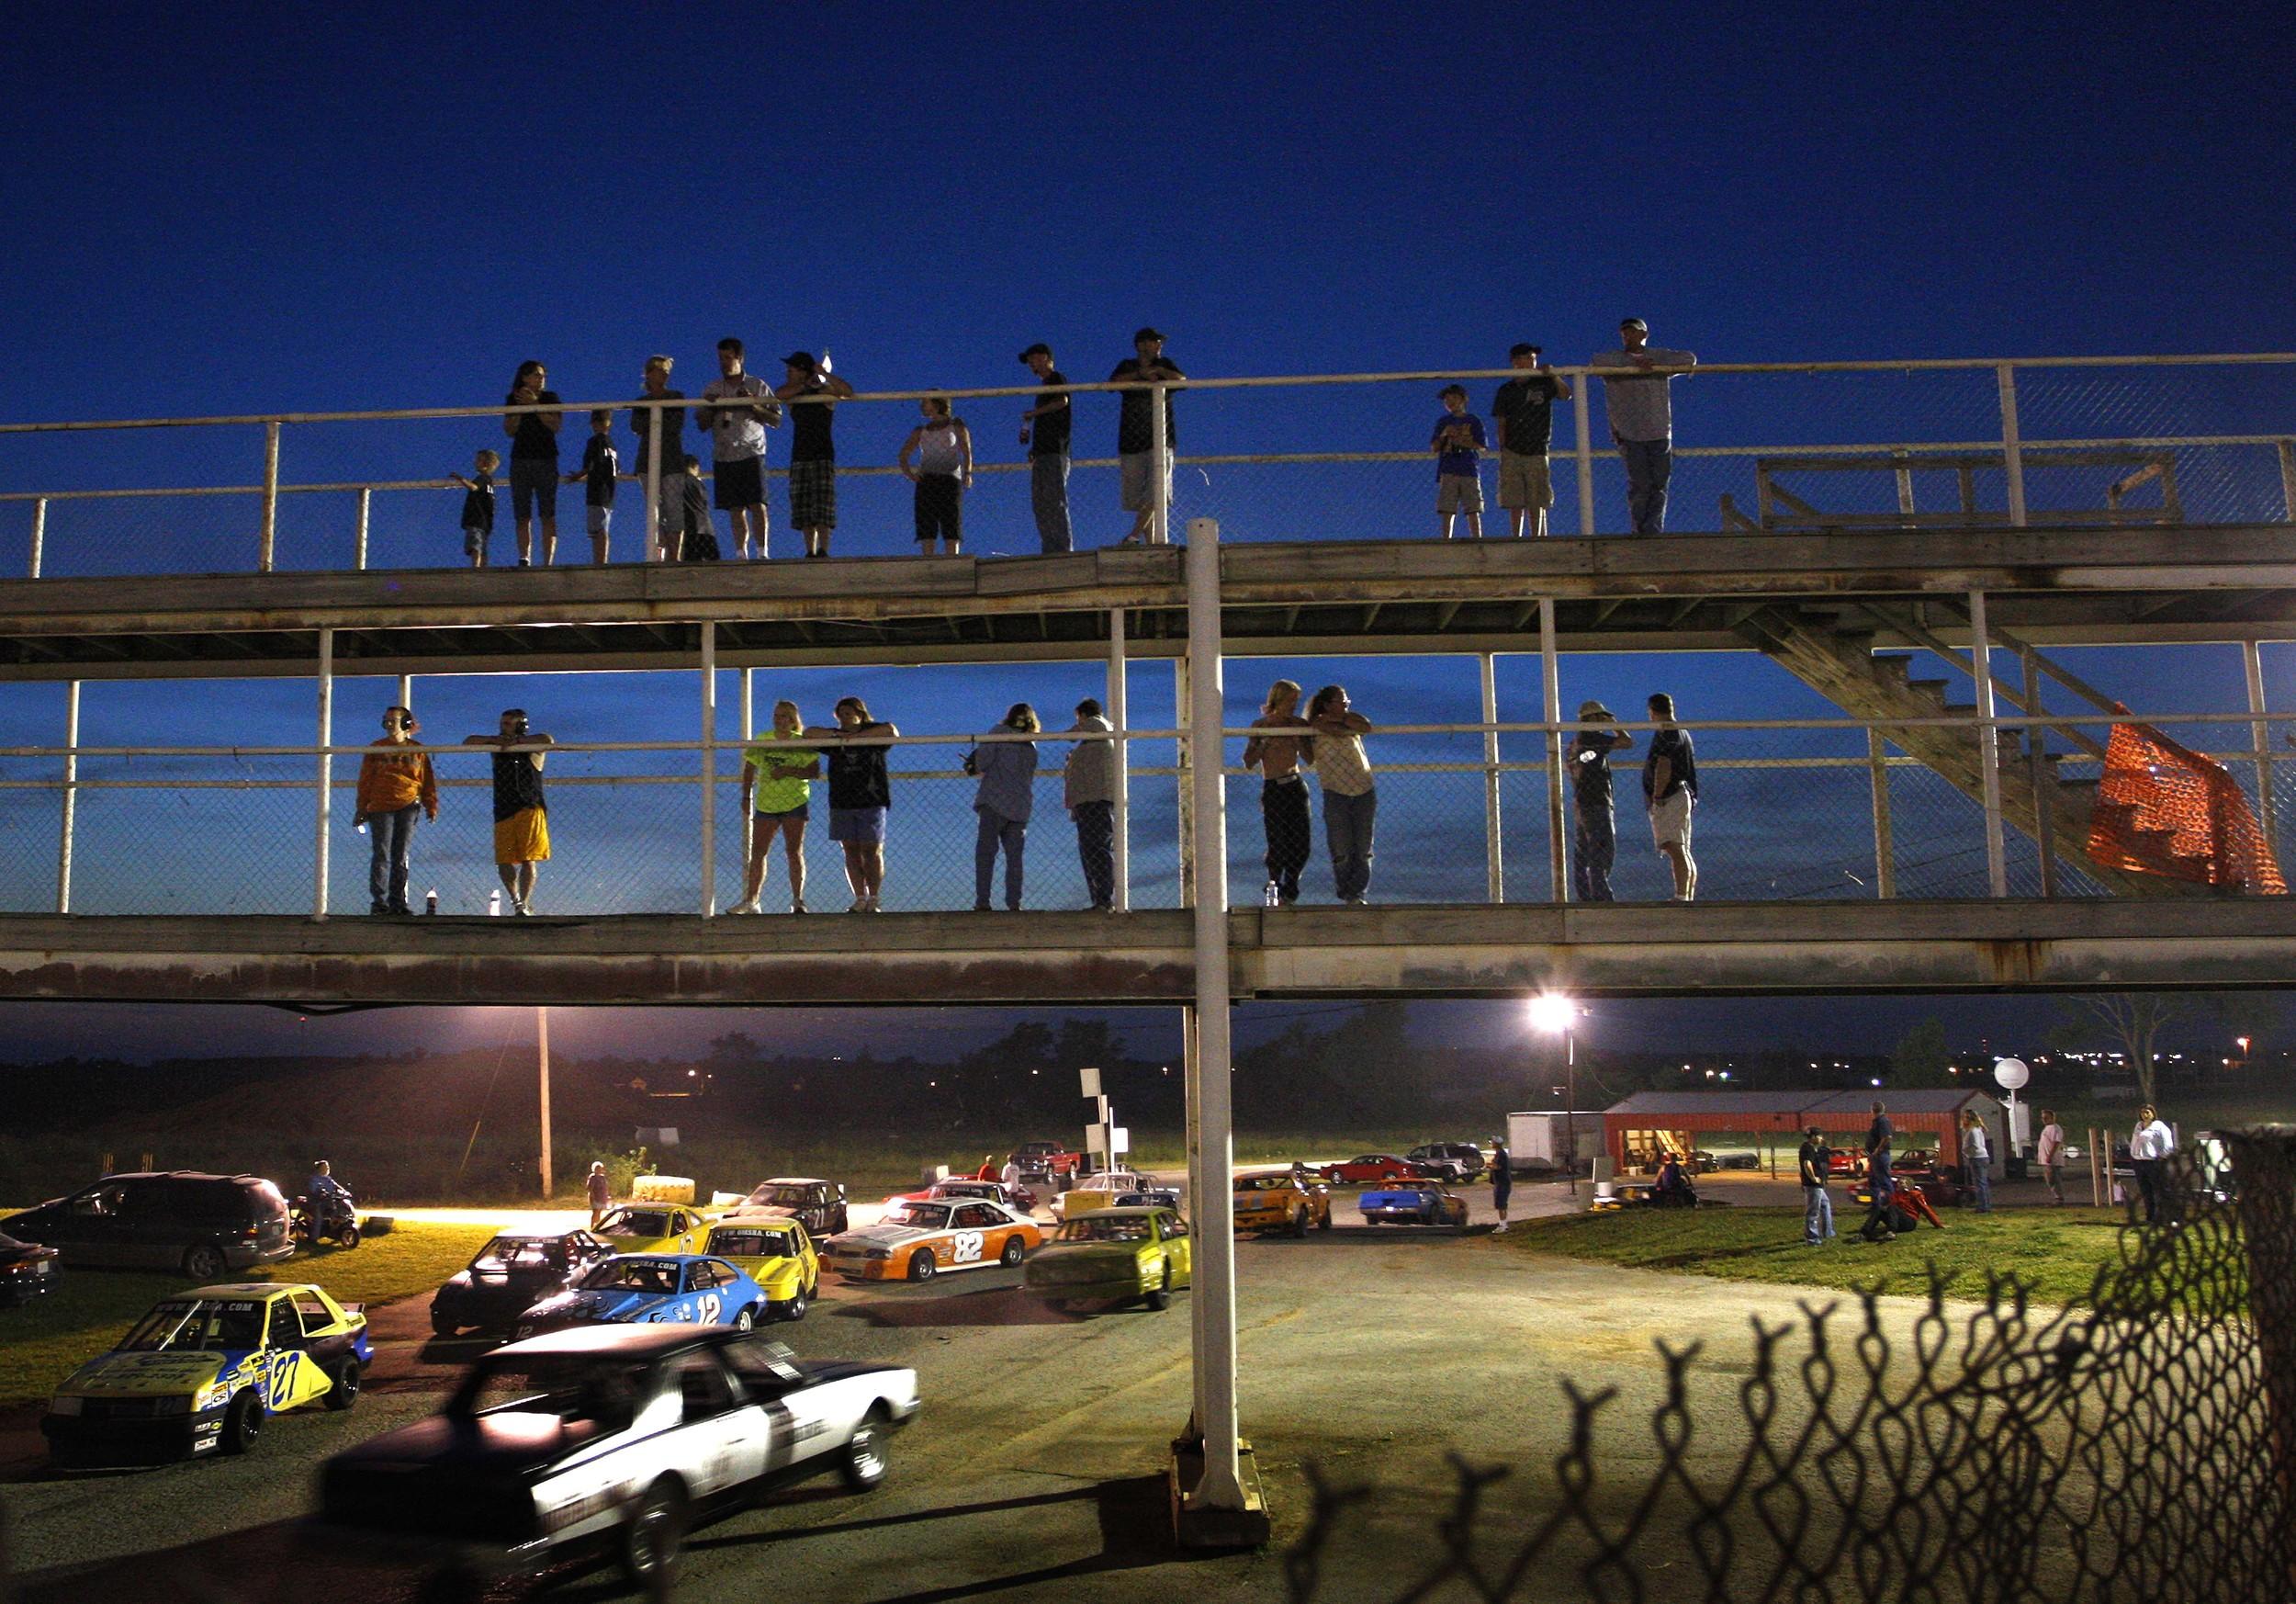 Stock Car racing in Bolivar, Missouri